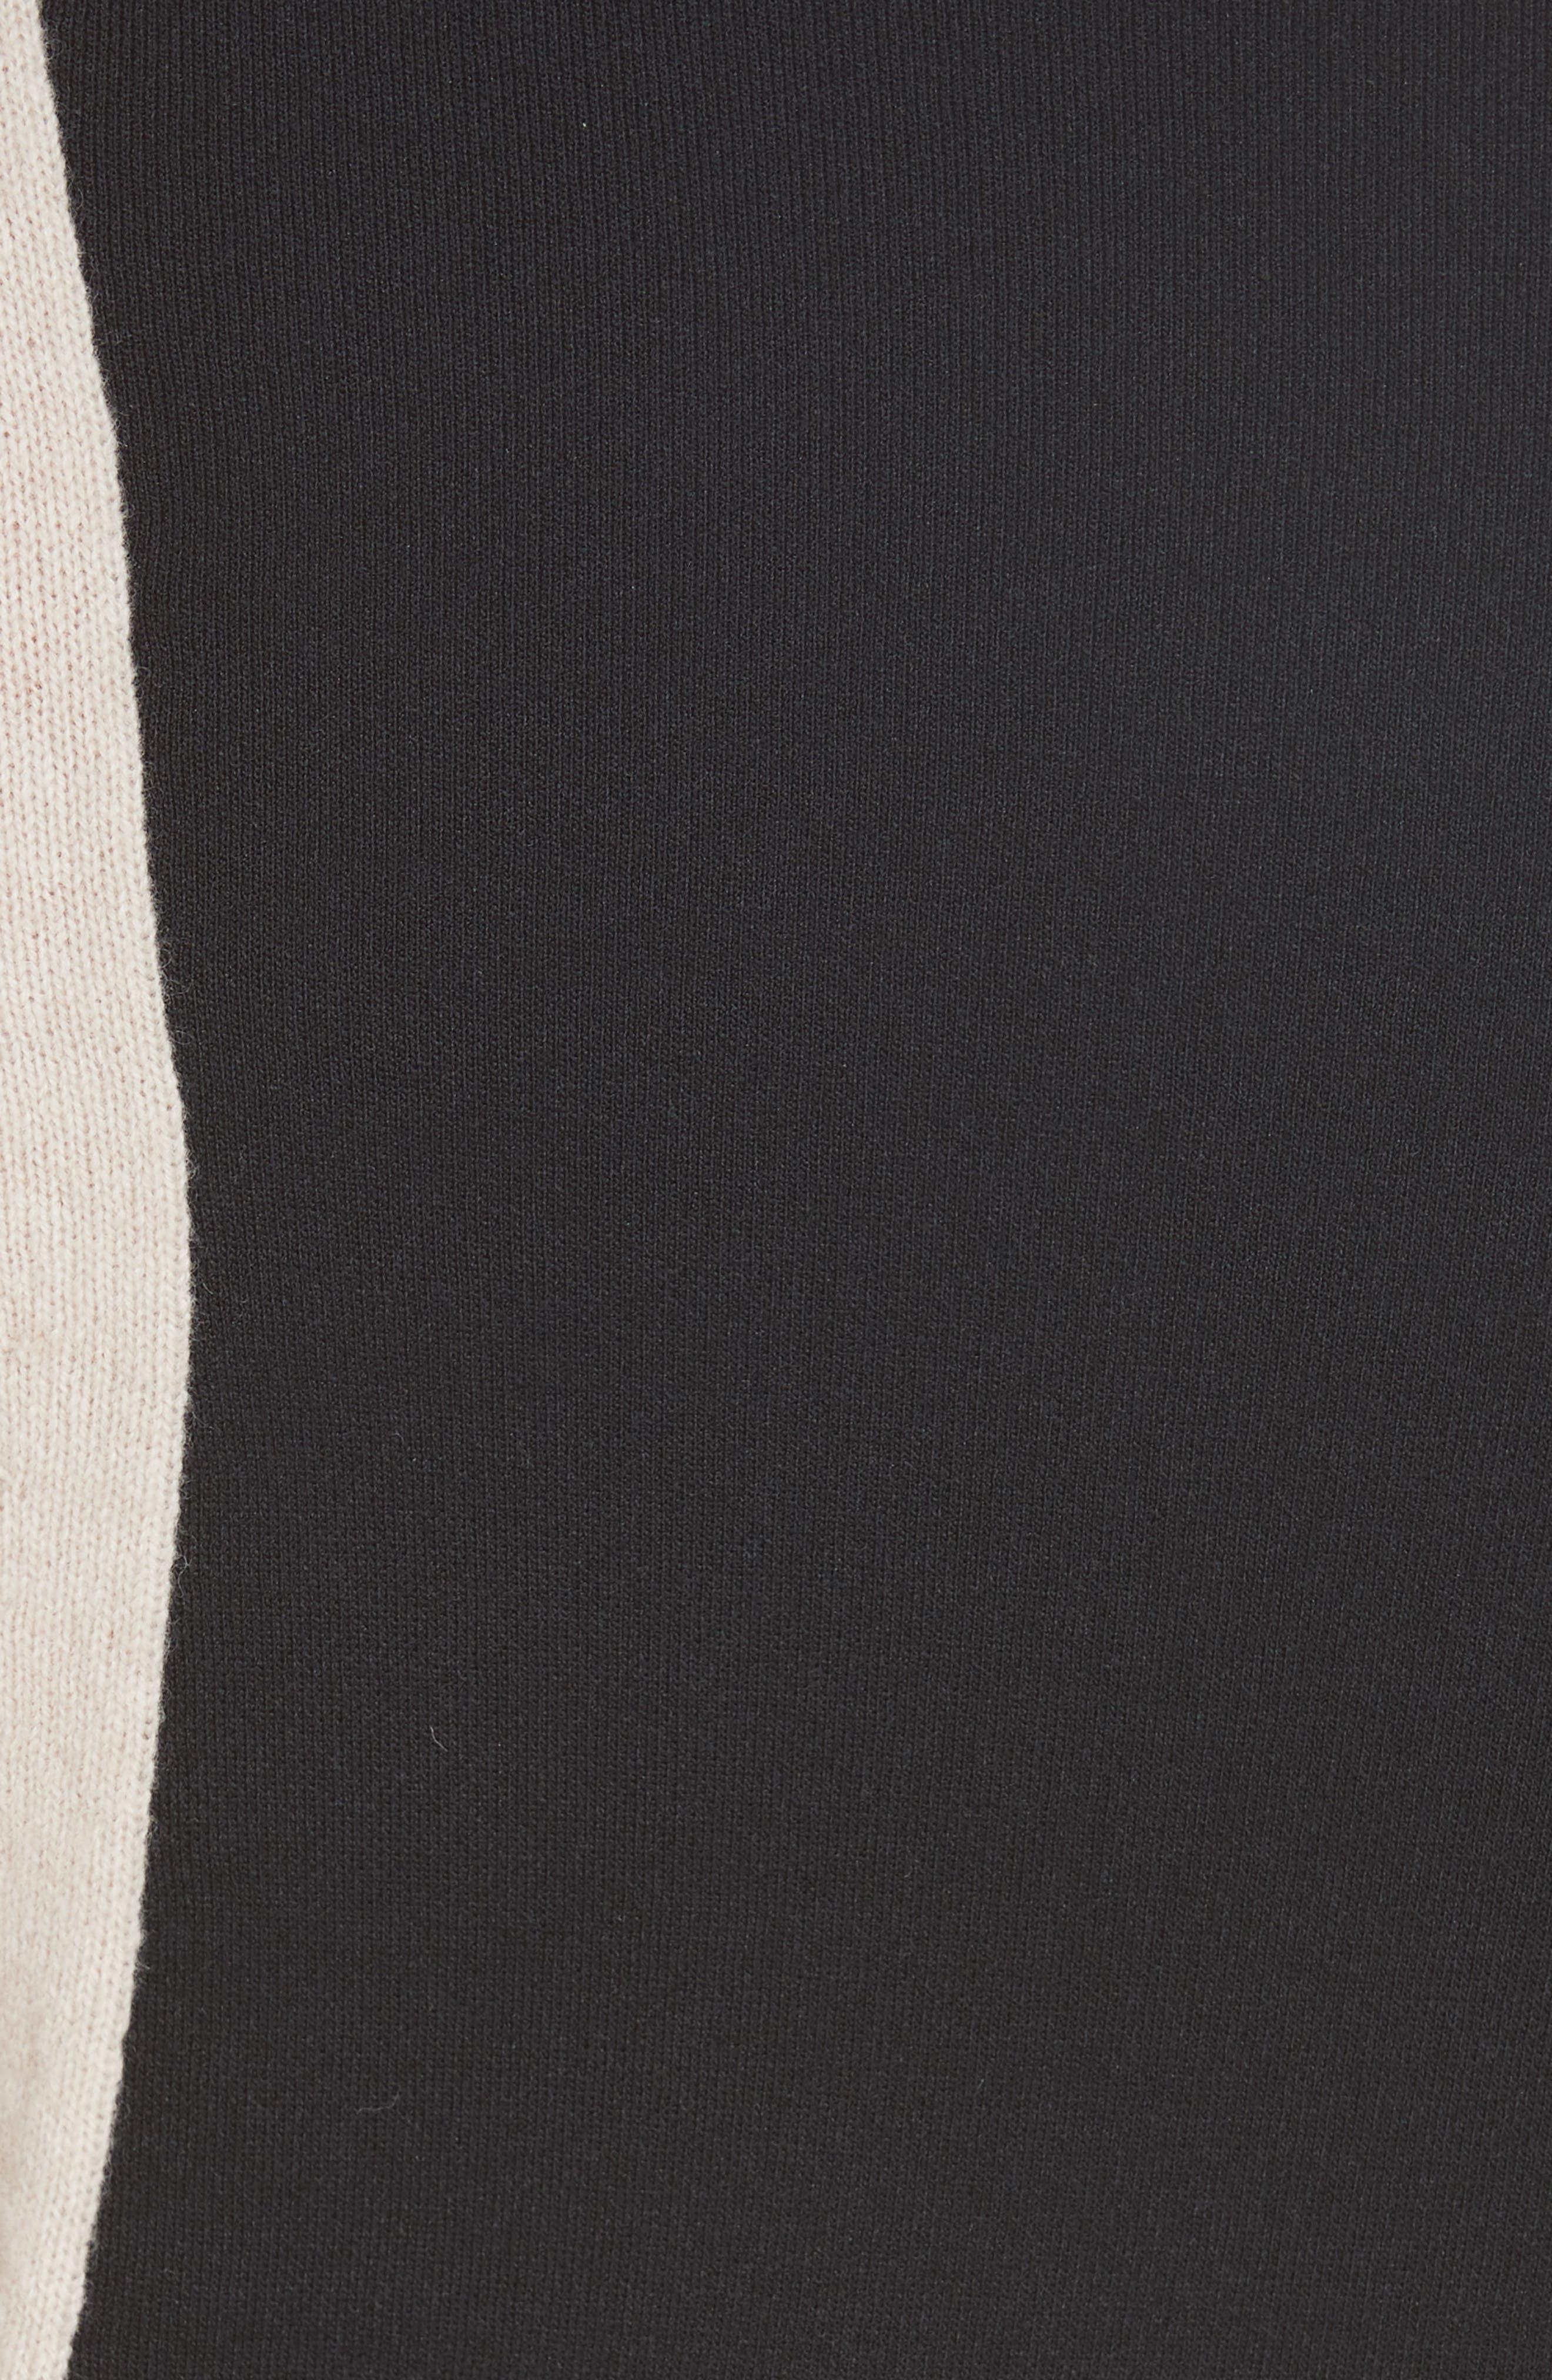 Colorblock Wool Blend Turtleneck Sweater,                             Alternate thumbnail 5, color,                             BLACK/ NUT